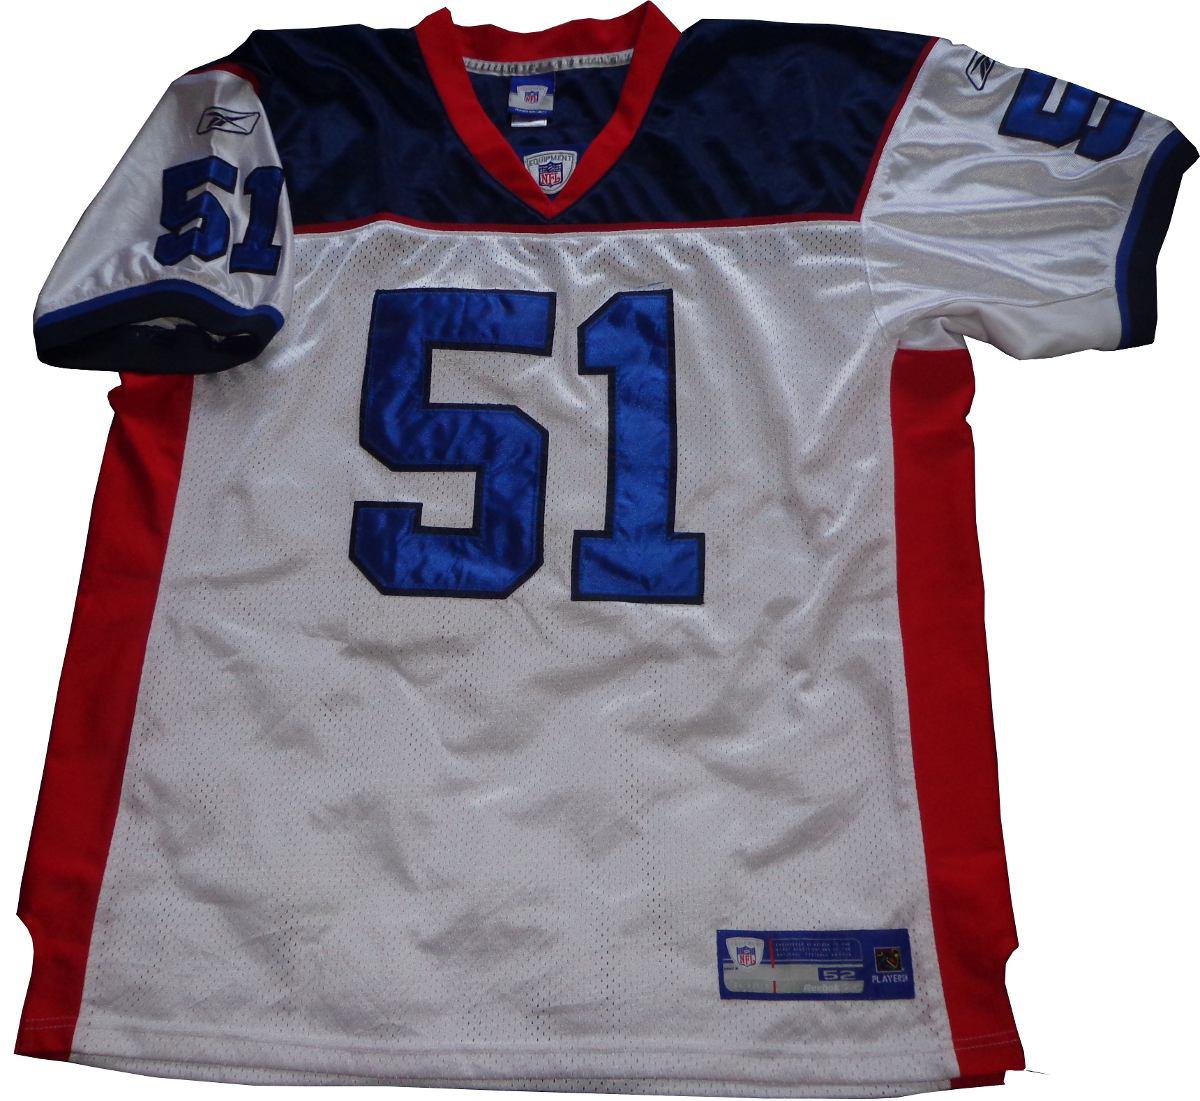 1280014d3 ... Camiseta Buffalo Bills Futbol Americano Reebok Nfl Usa - 75 Jersey ...